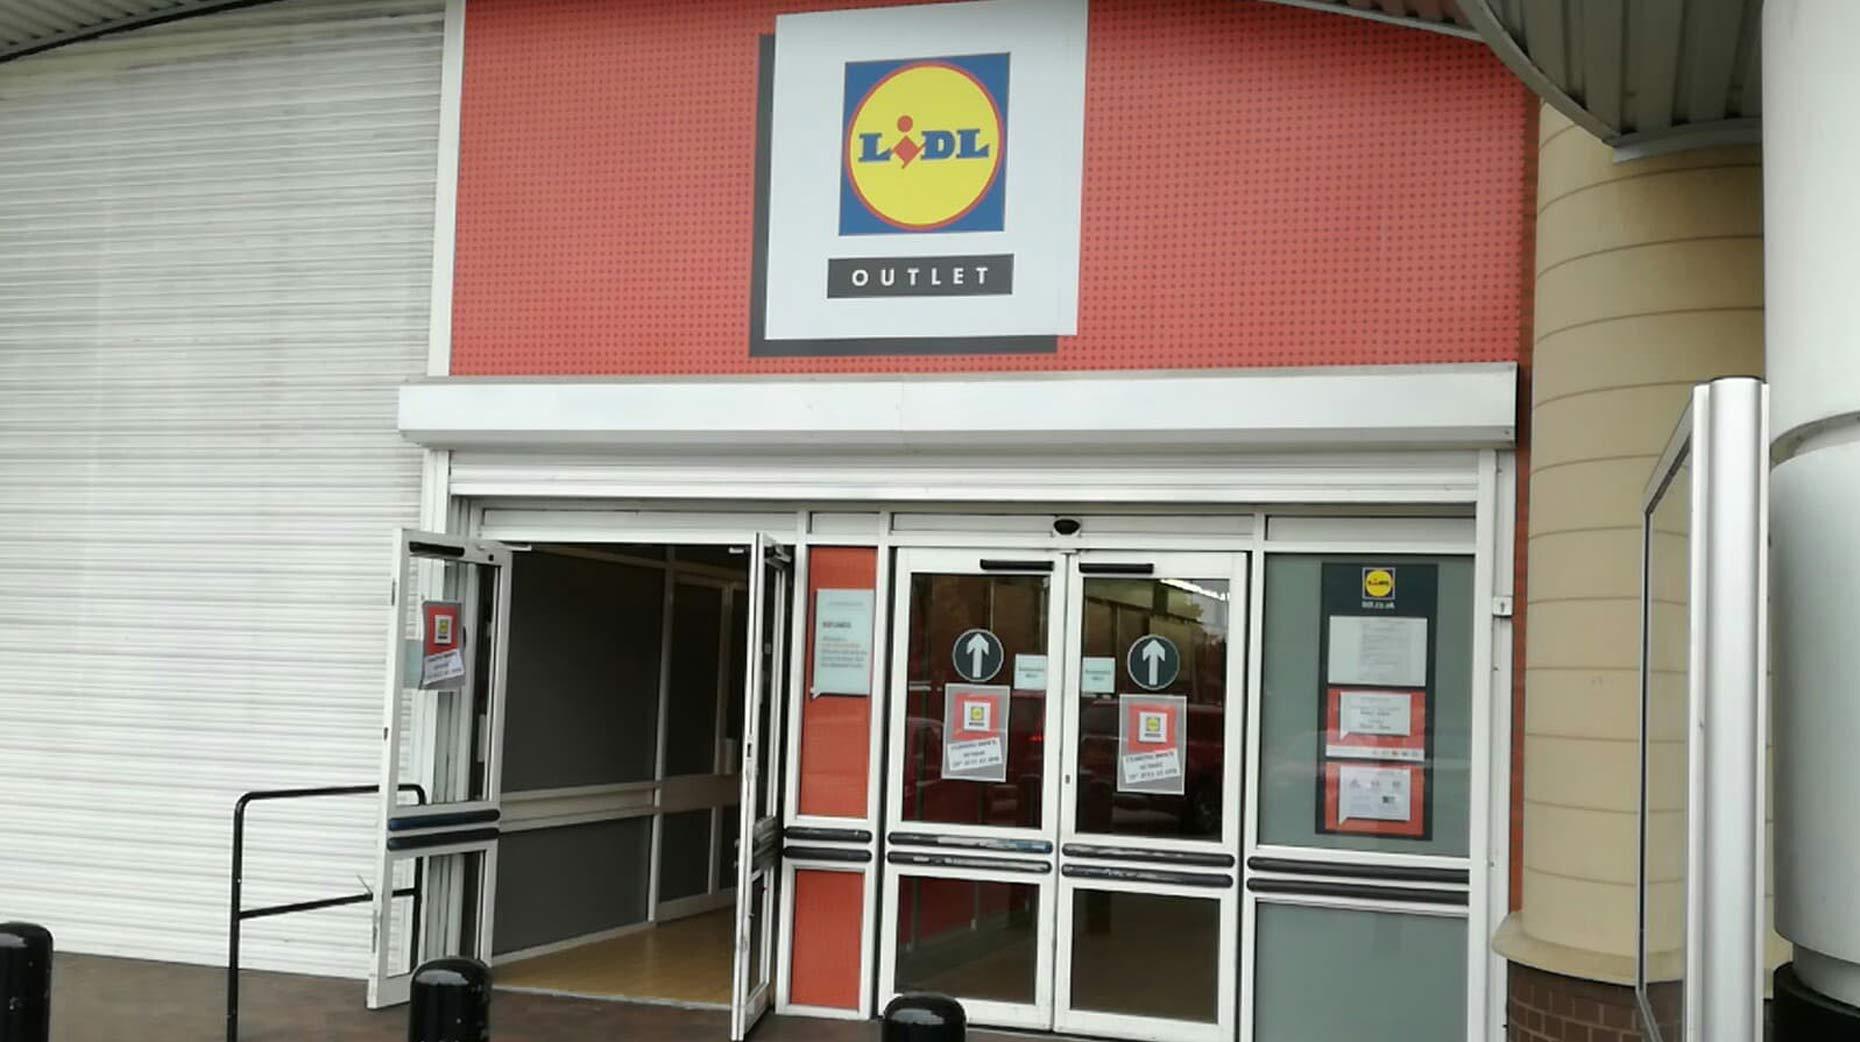 St Marks Lidl Outlet Shutting For Good